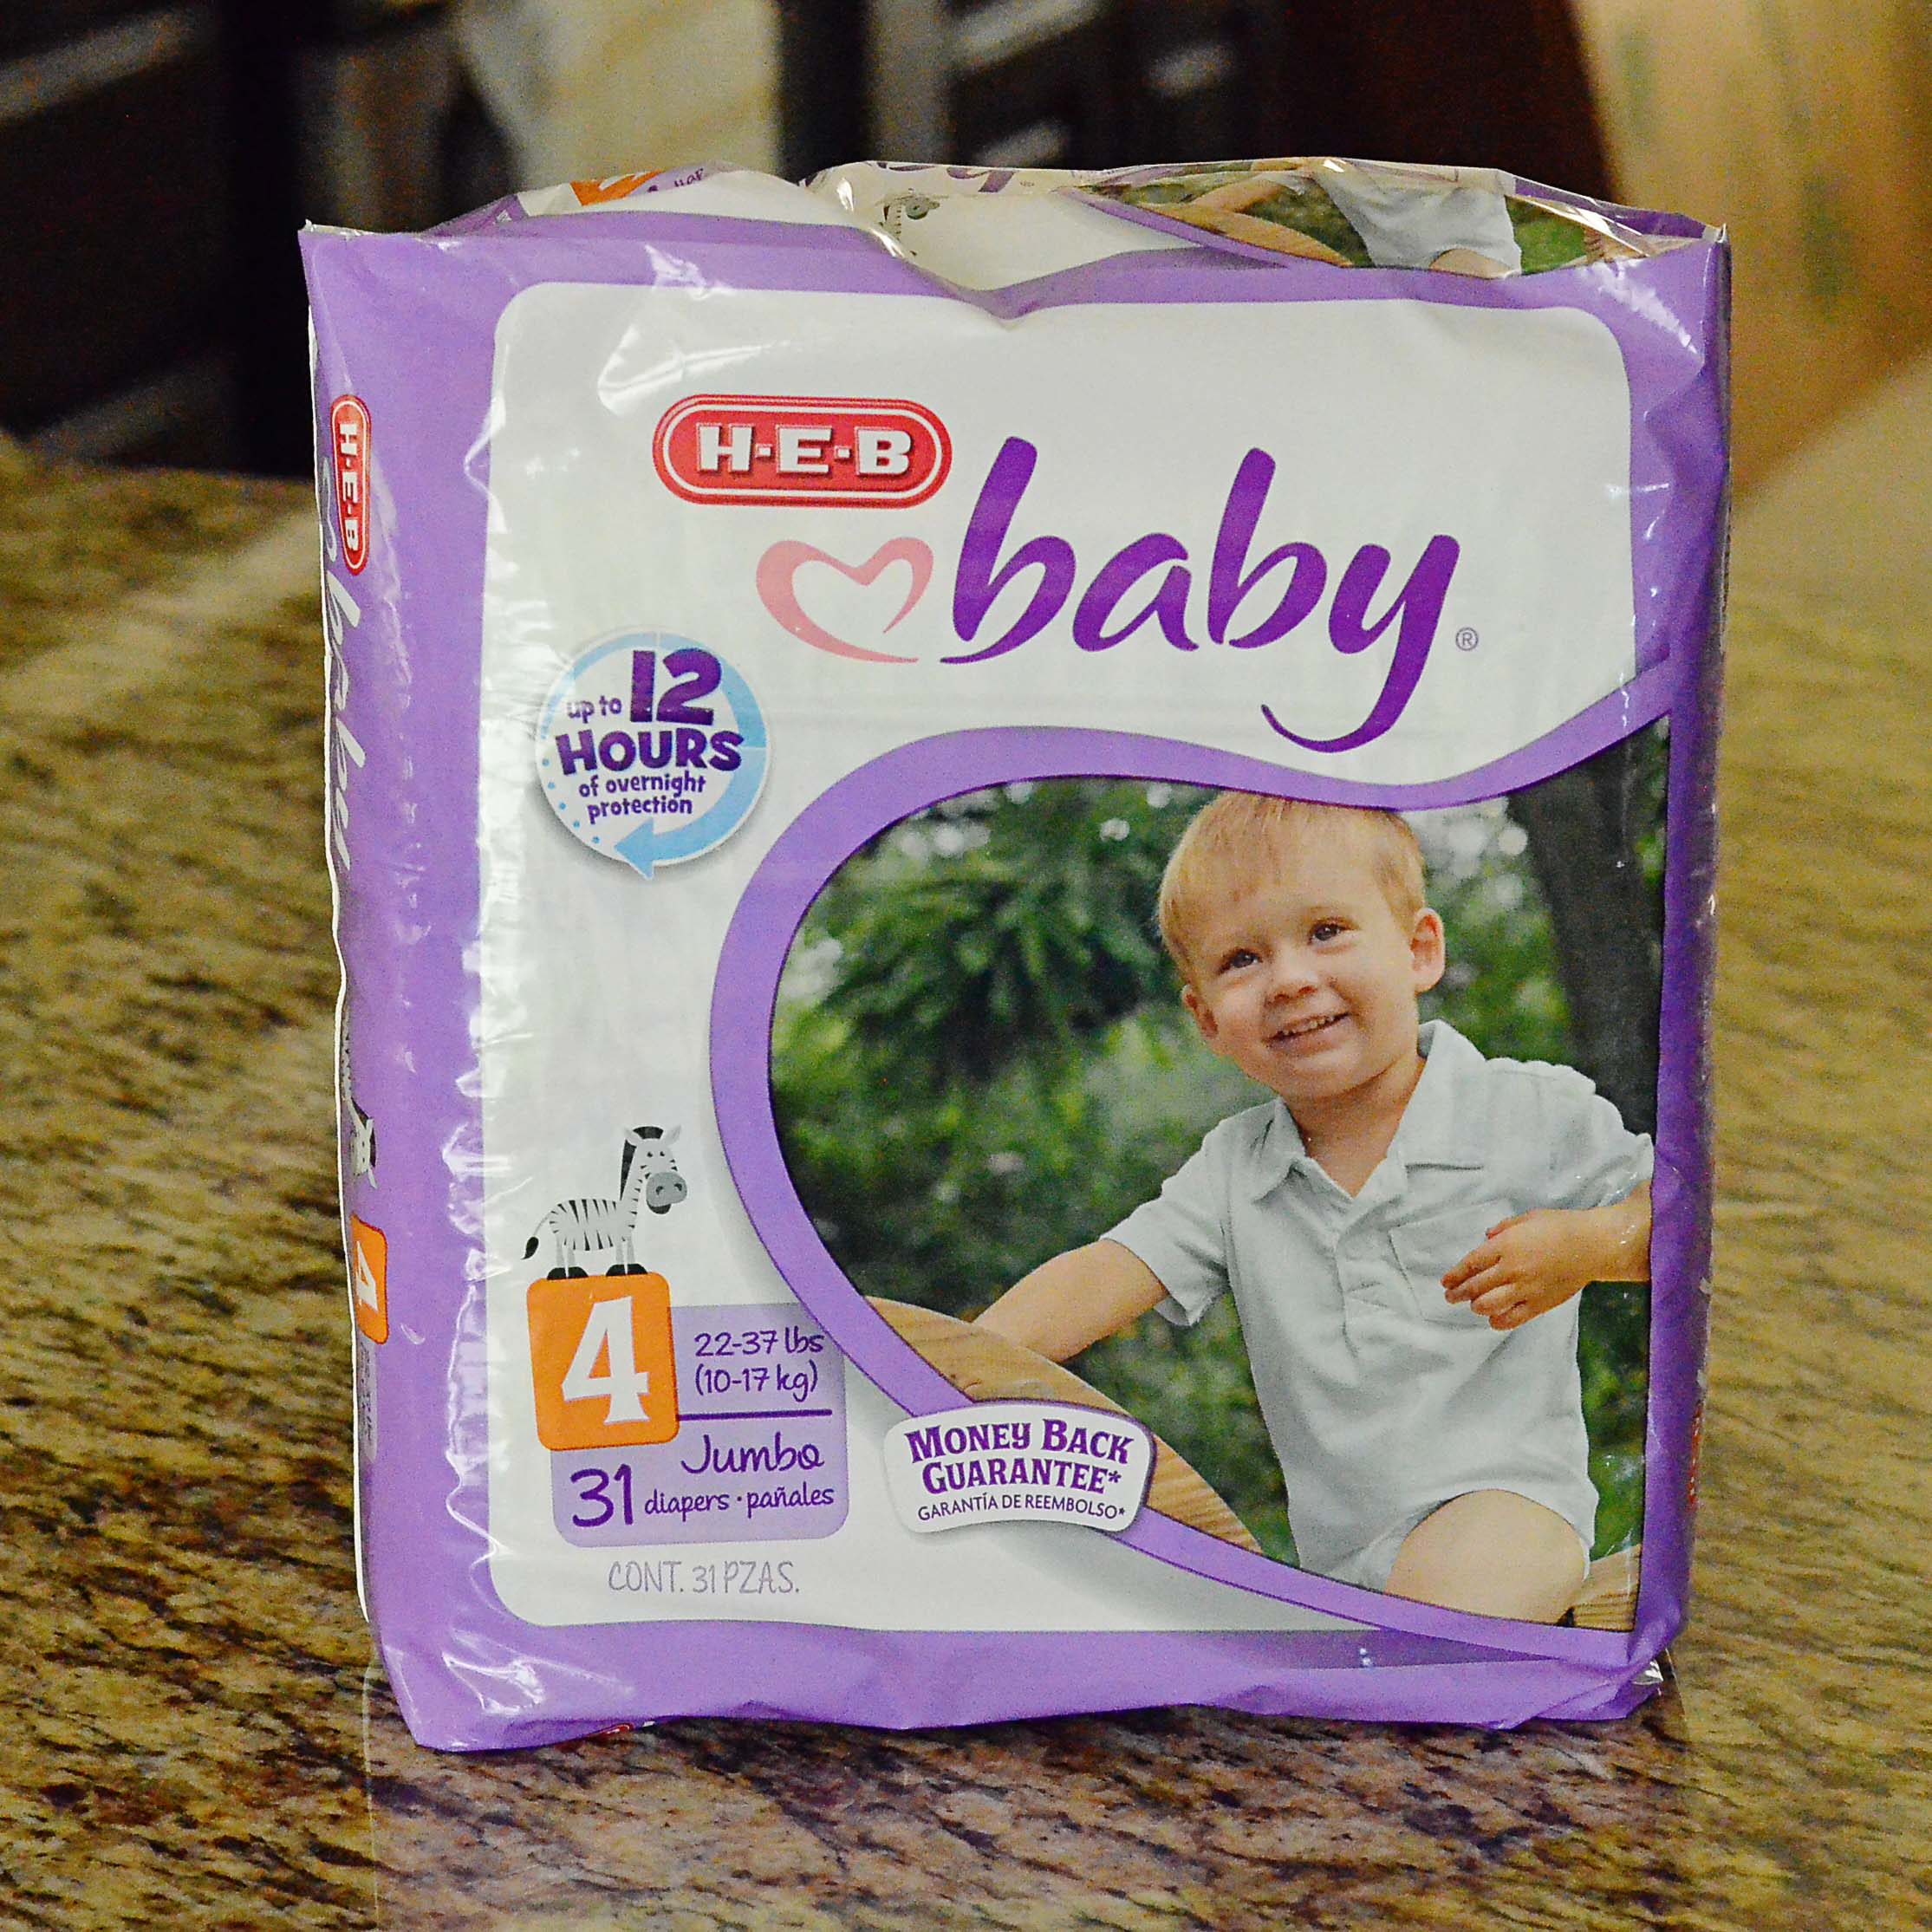 Quality Diaper June 2014 Catalog - Bing images